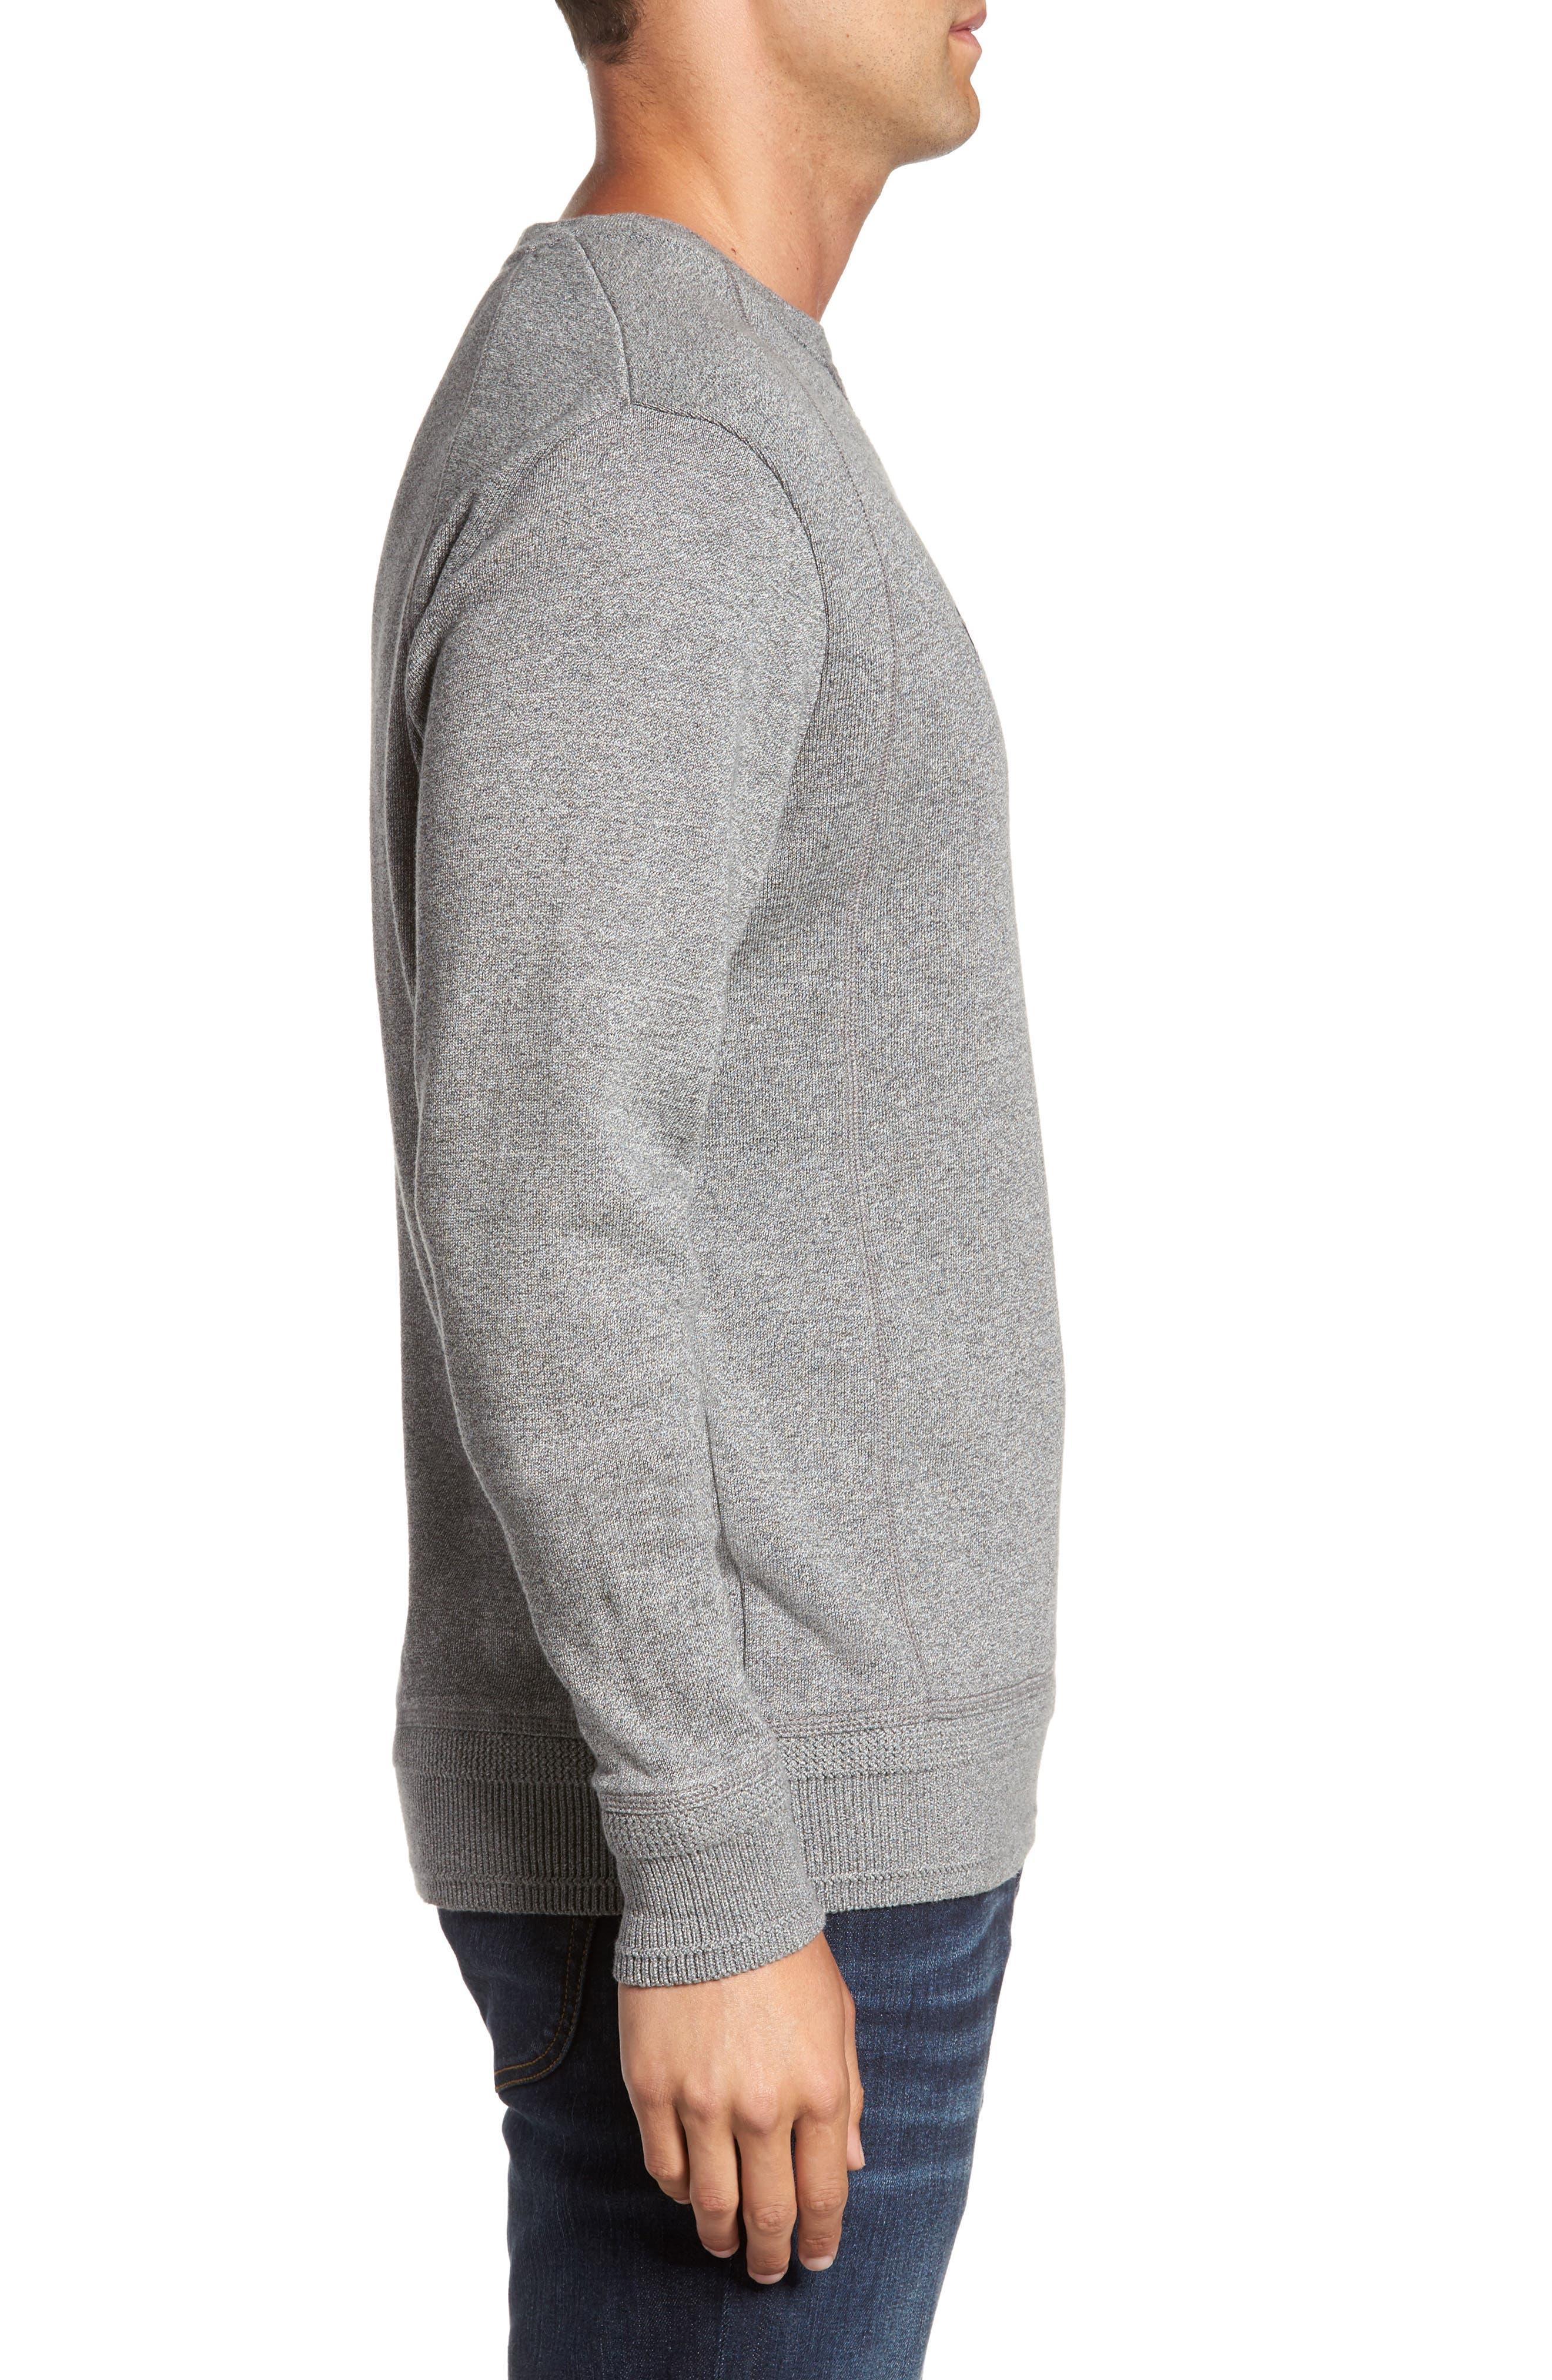 NFL Stitch of Liberty Embroidered Crewneck Sweatshirt,                             Alternate thumbnail 88, color,